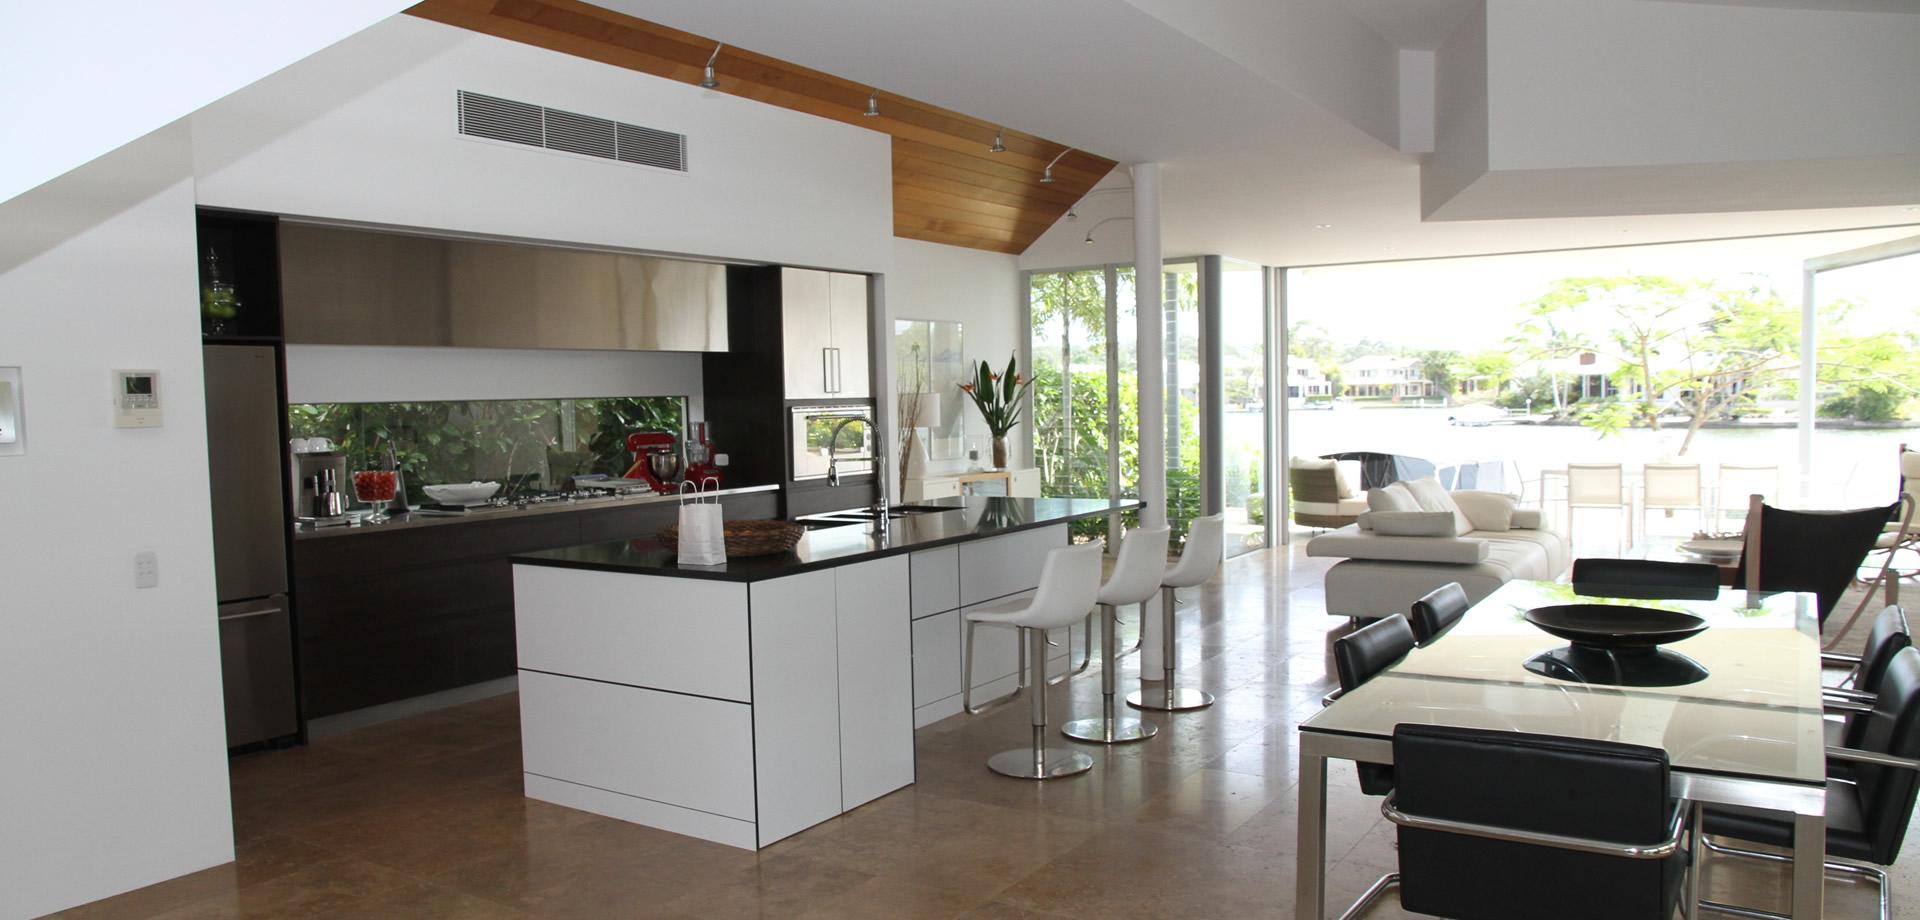 Home Improvement in Chamblee